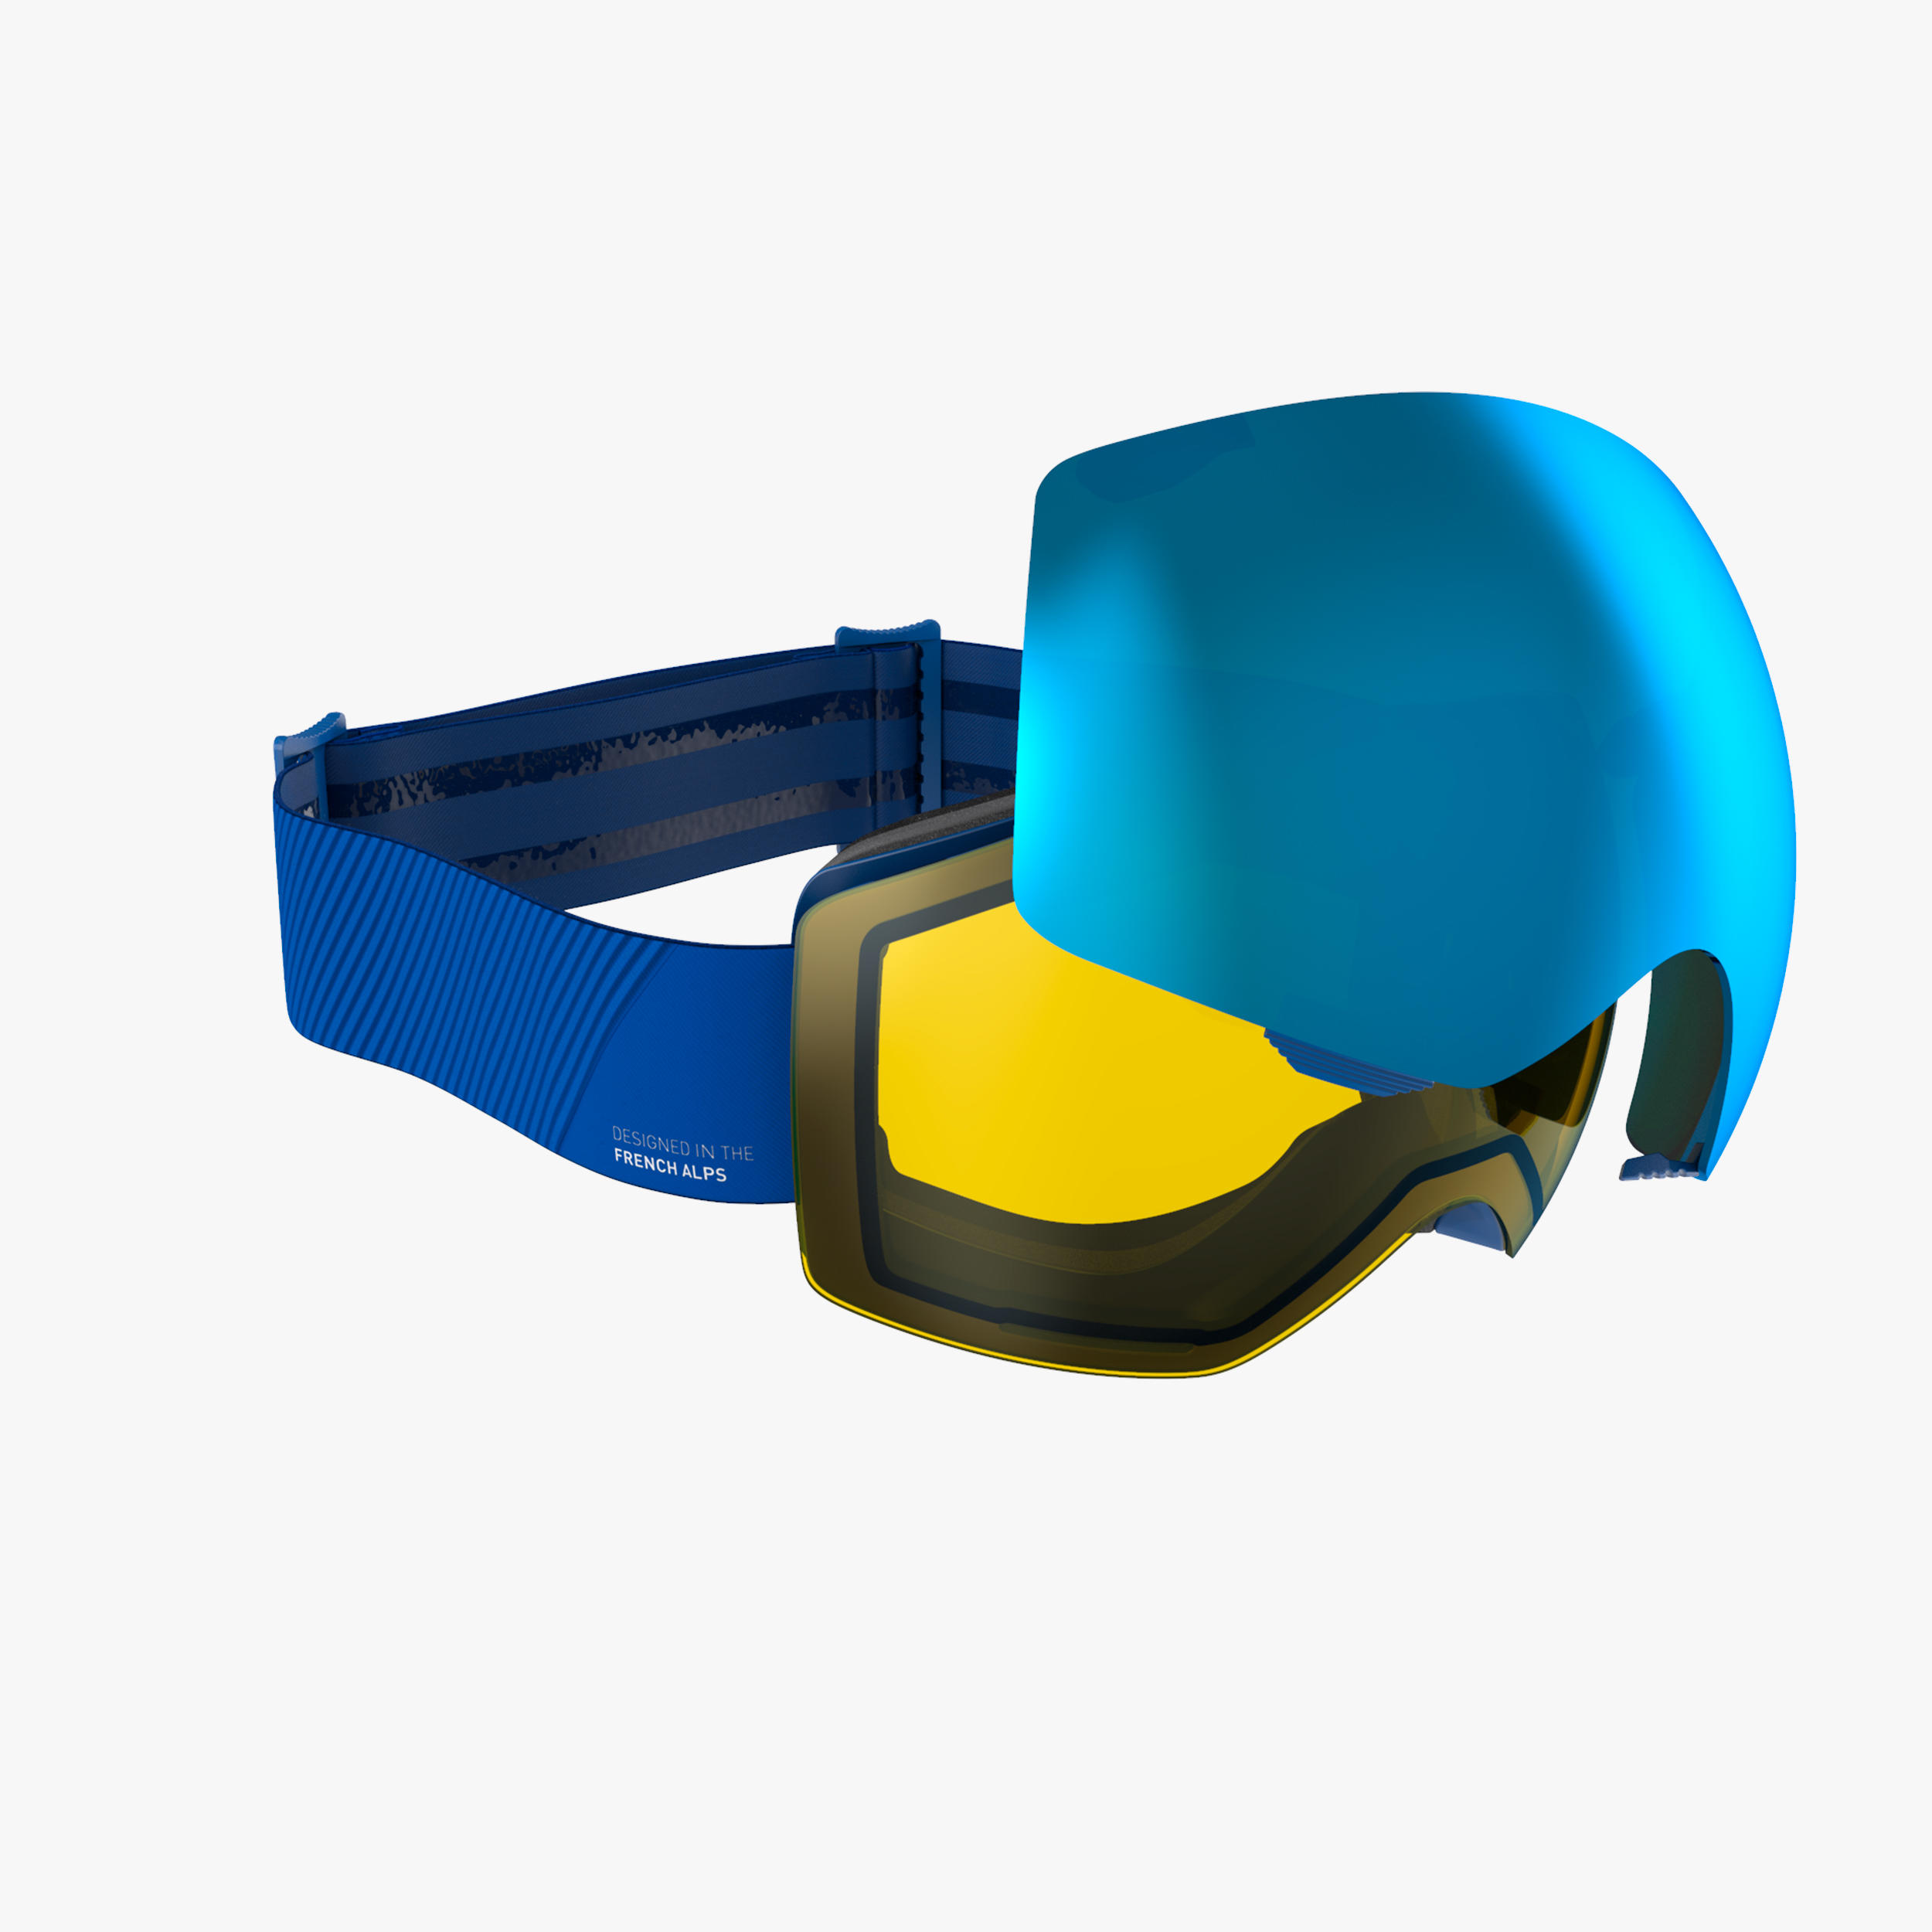 Ochelari schi/snowboard G900 imagine produs